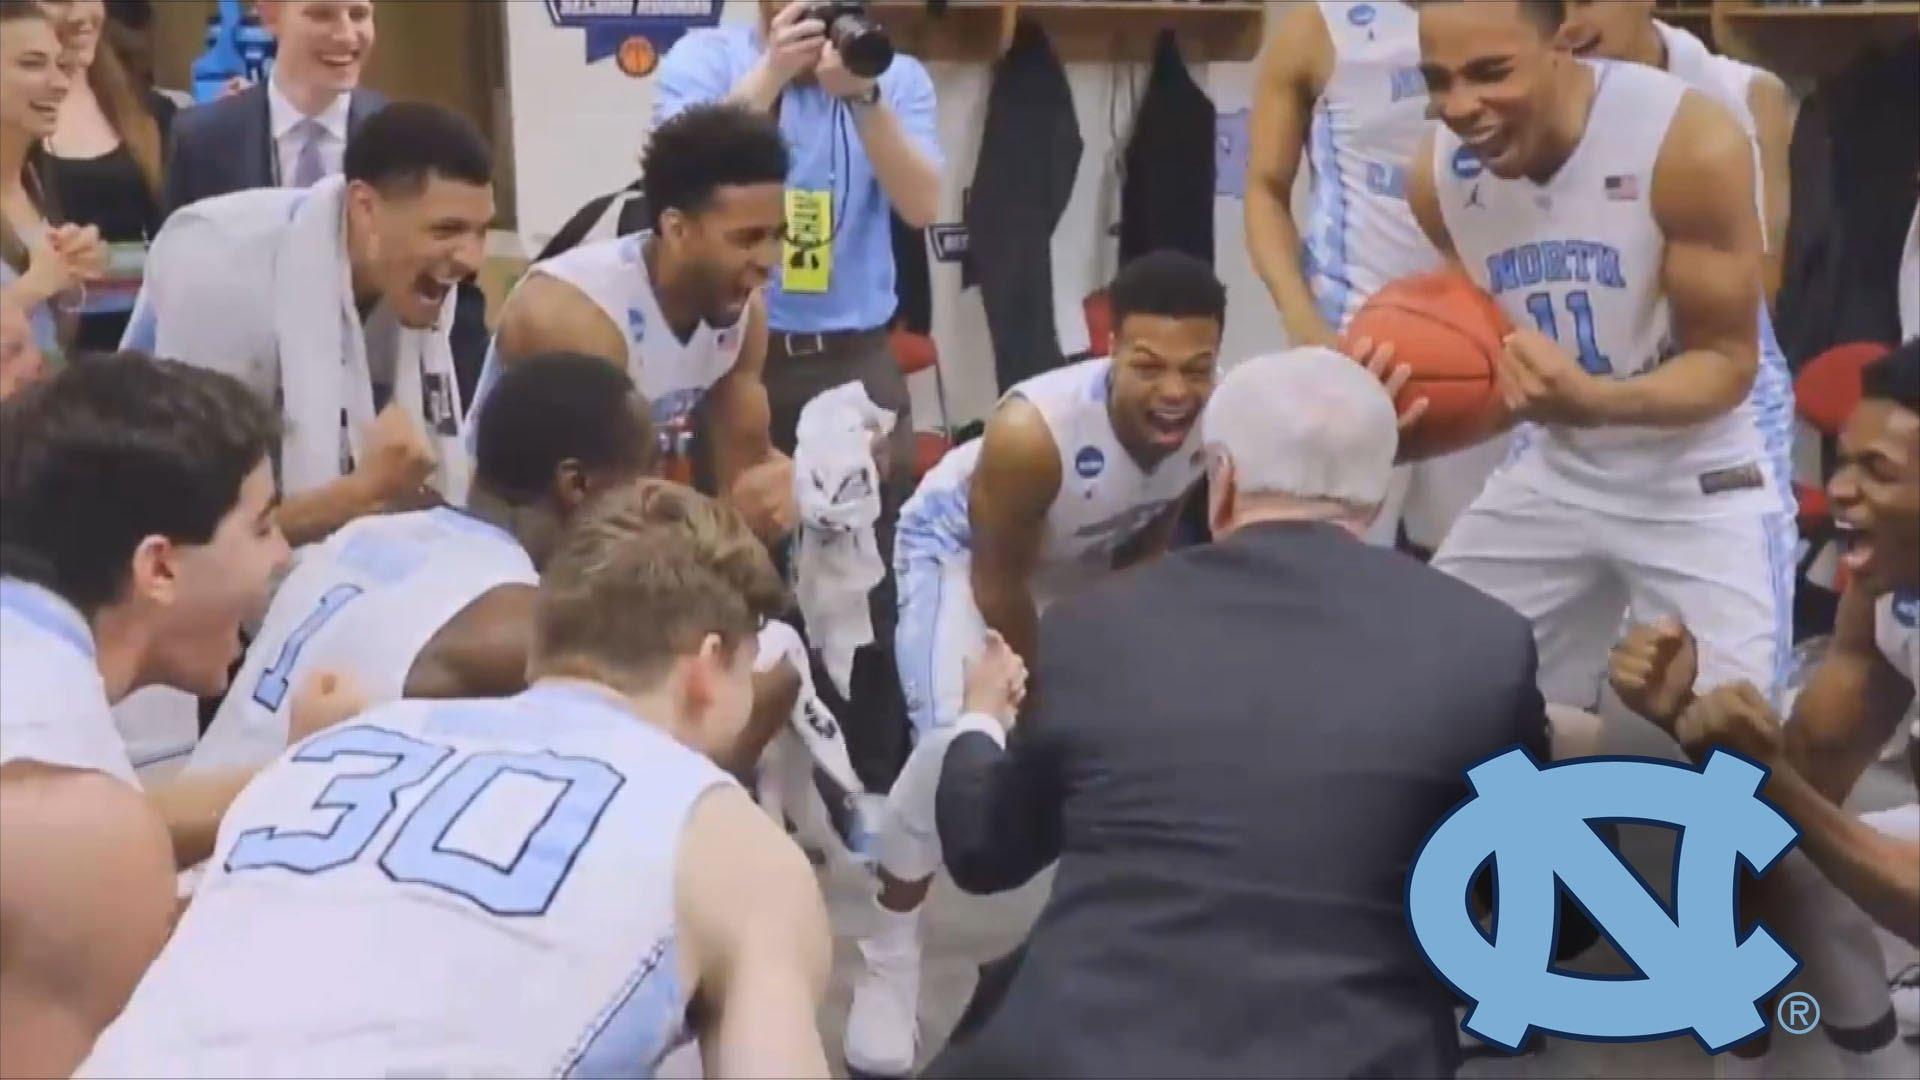 North Carolina celebrates Sweet 16 birth in the locker room